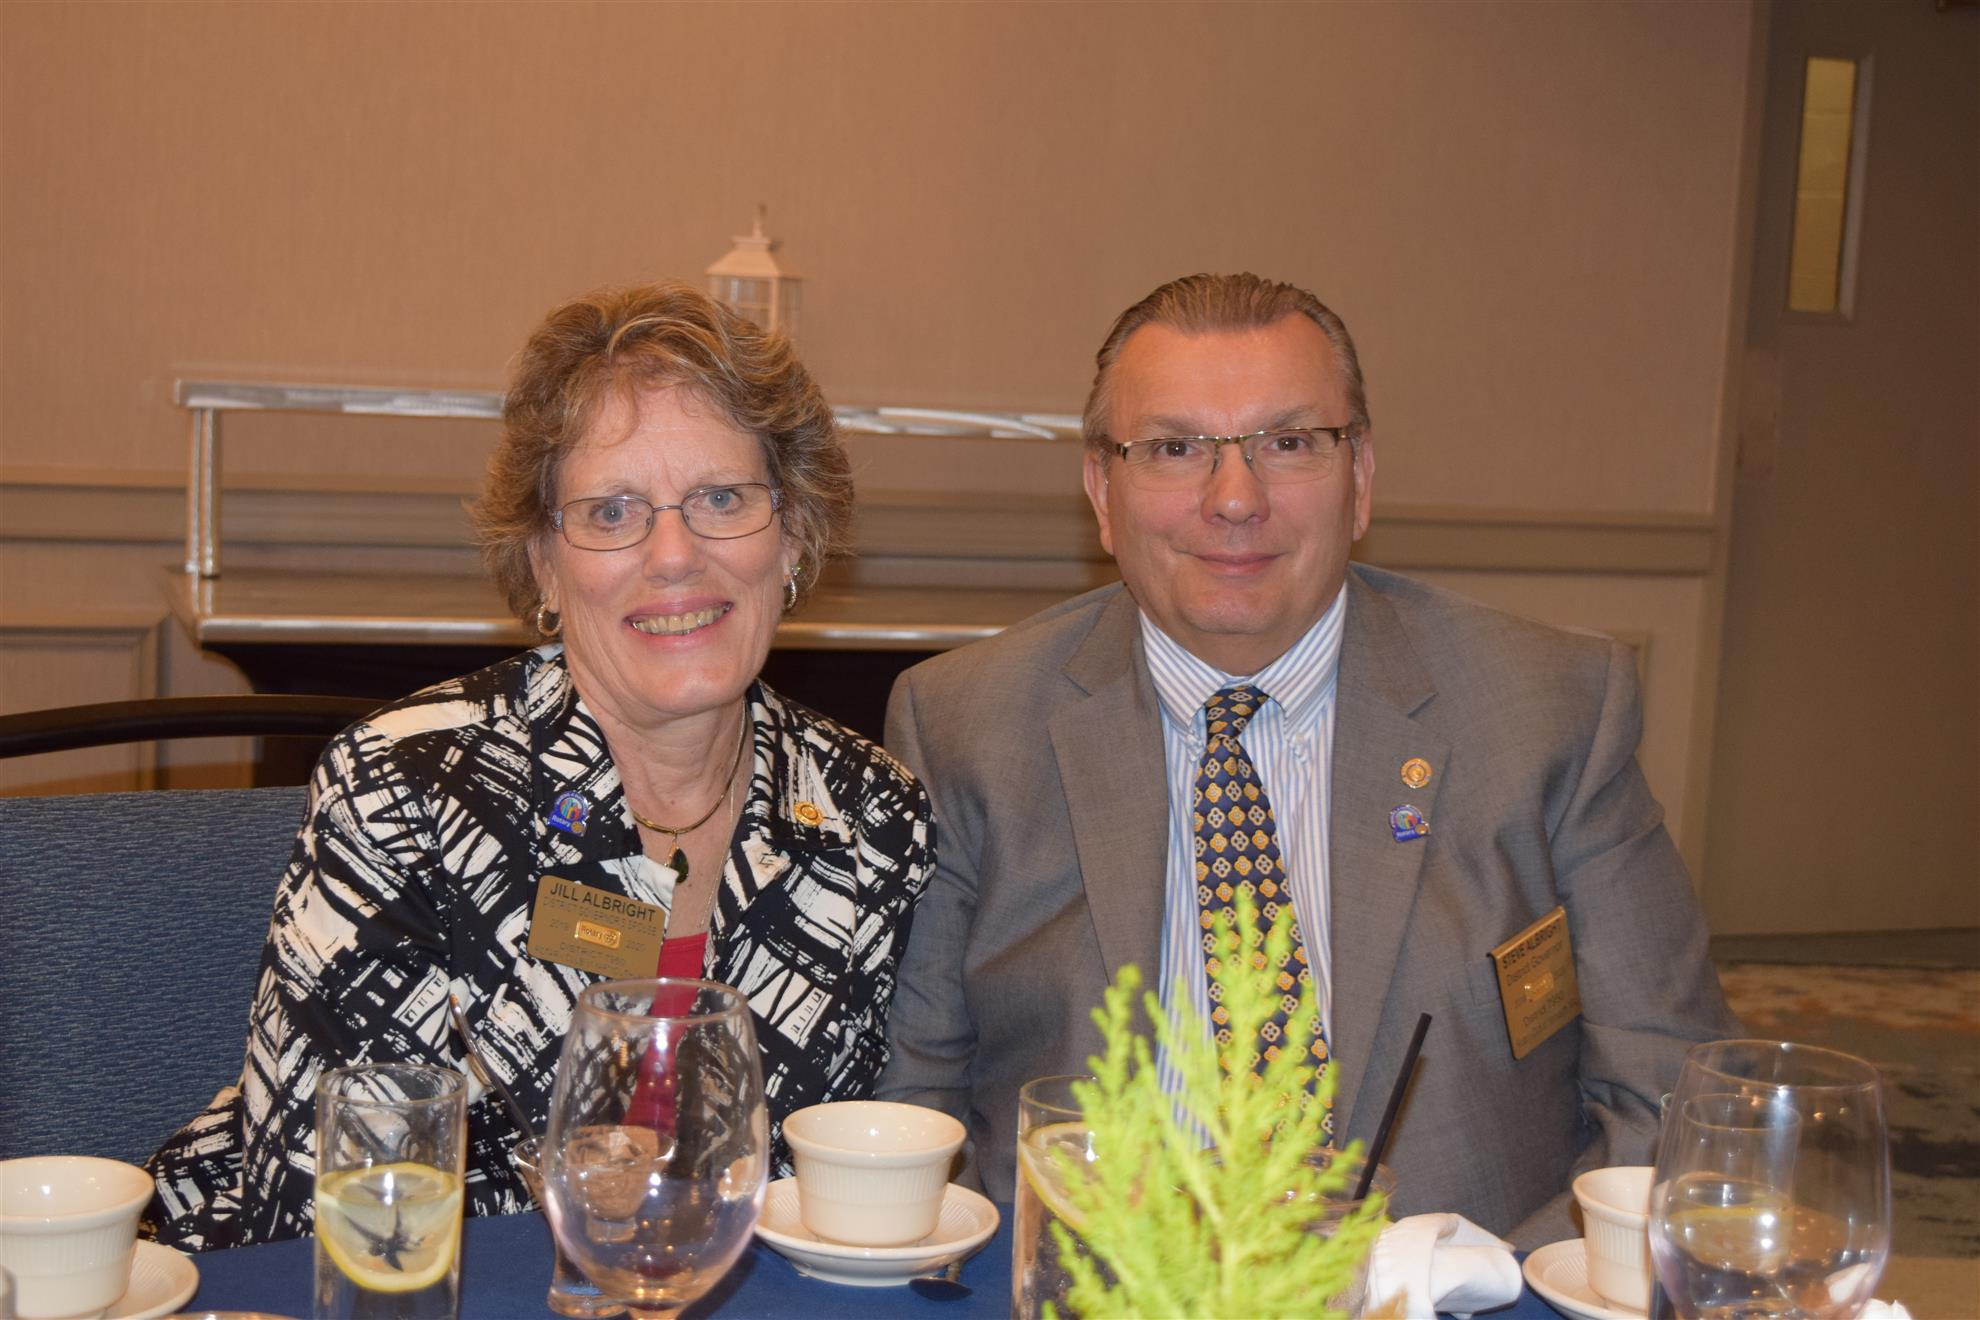 DGN Steve Albright & Jill